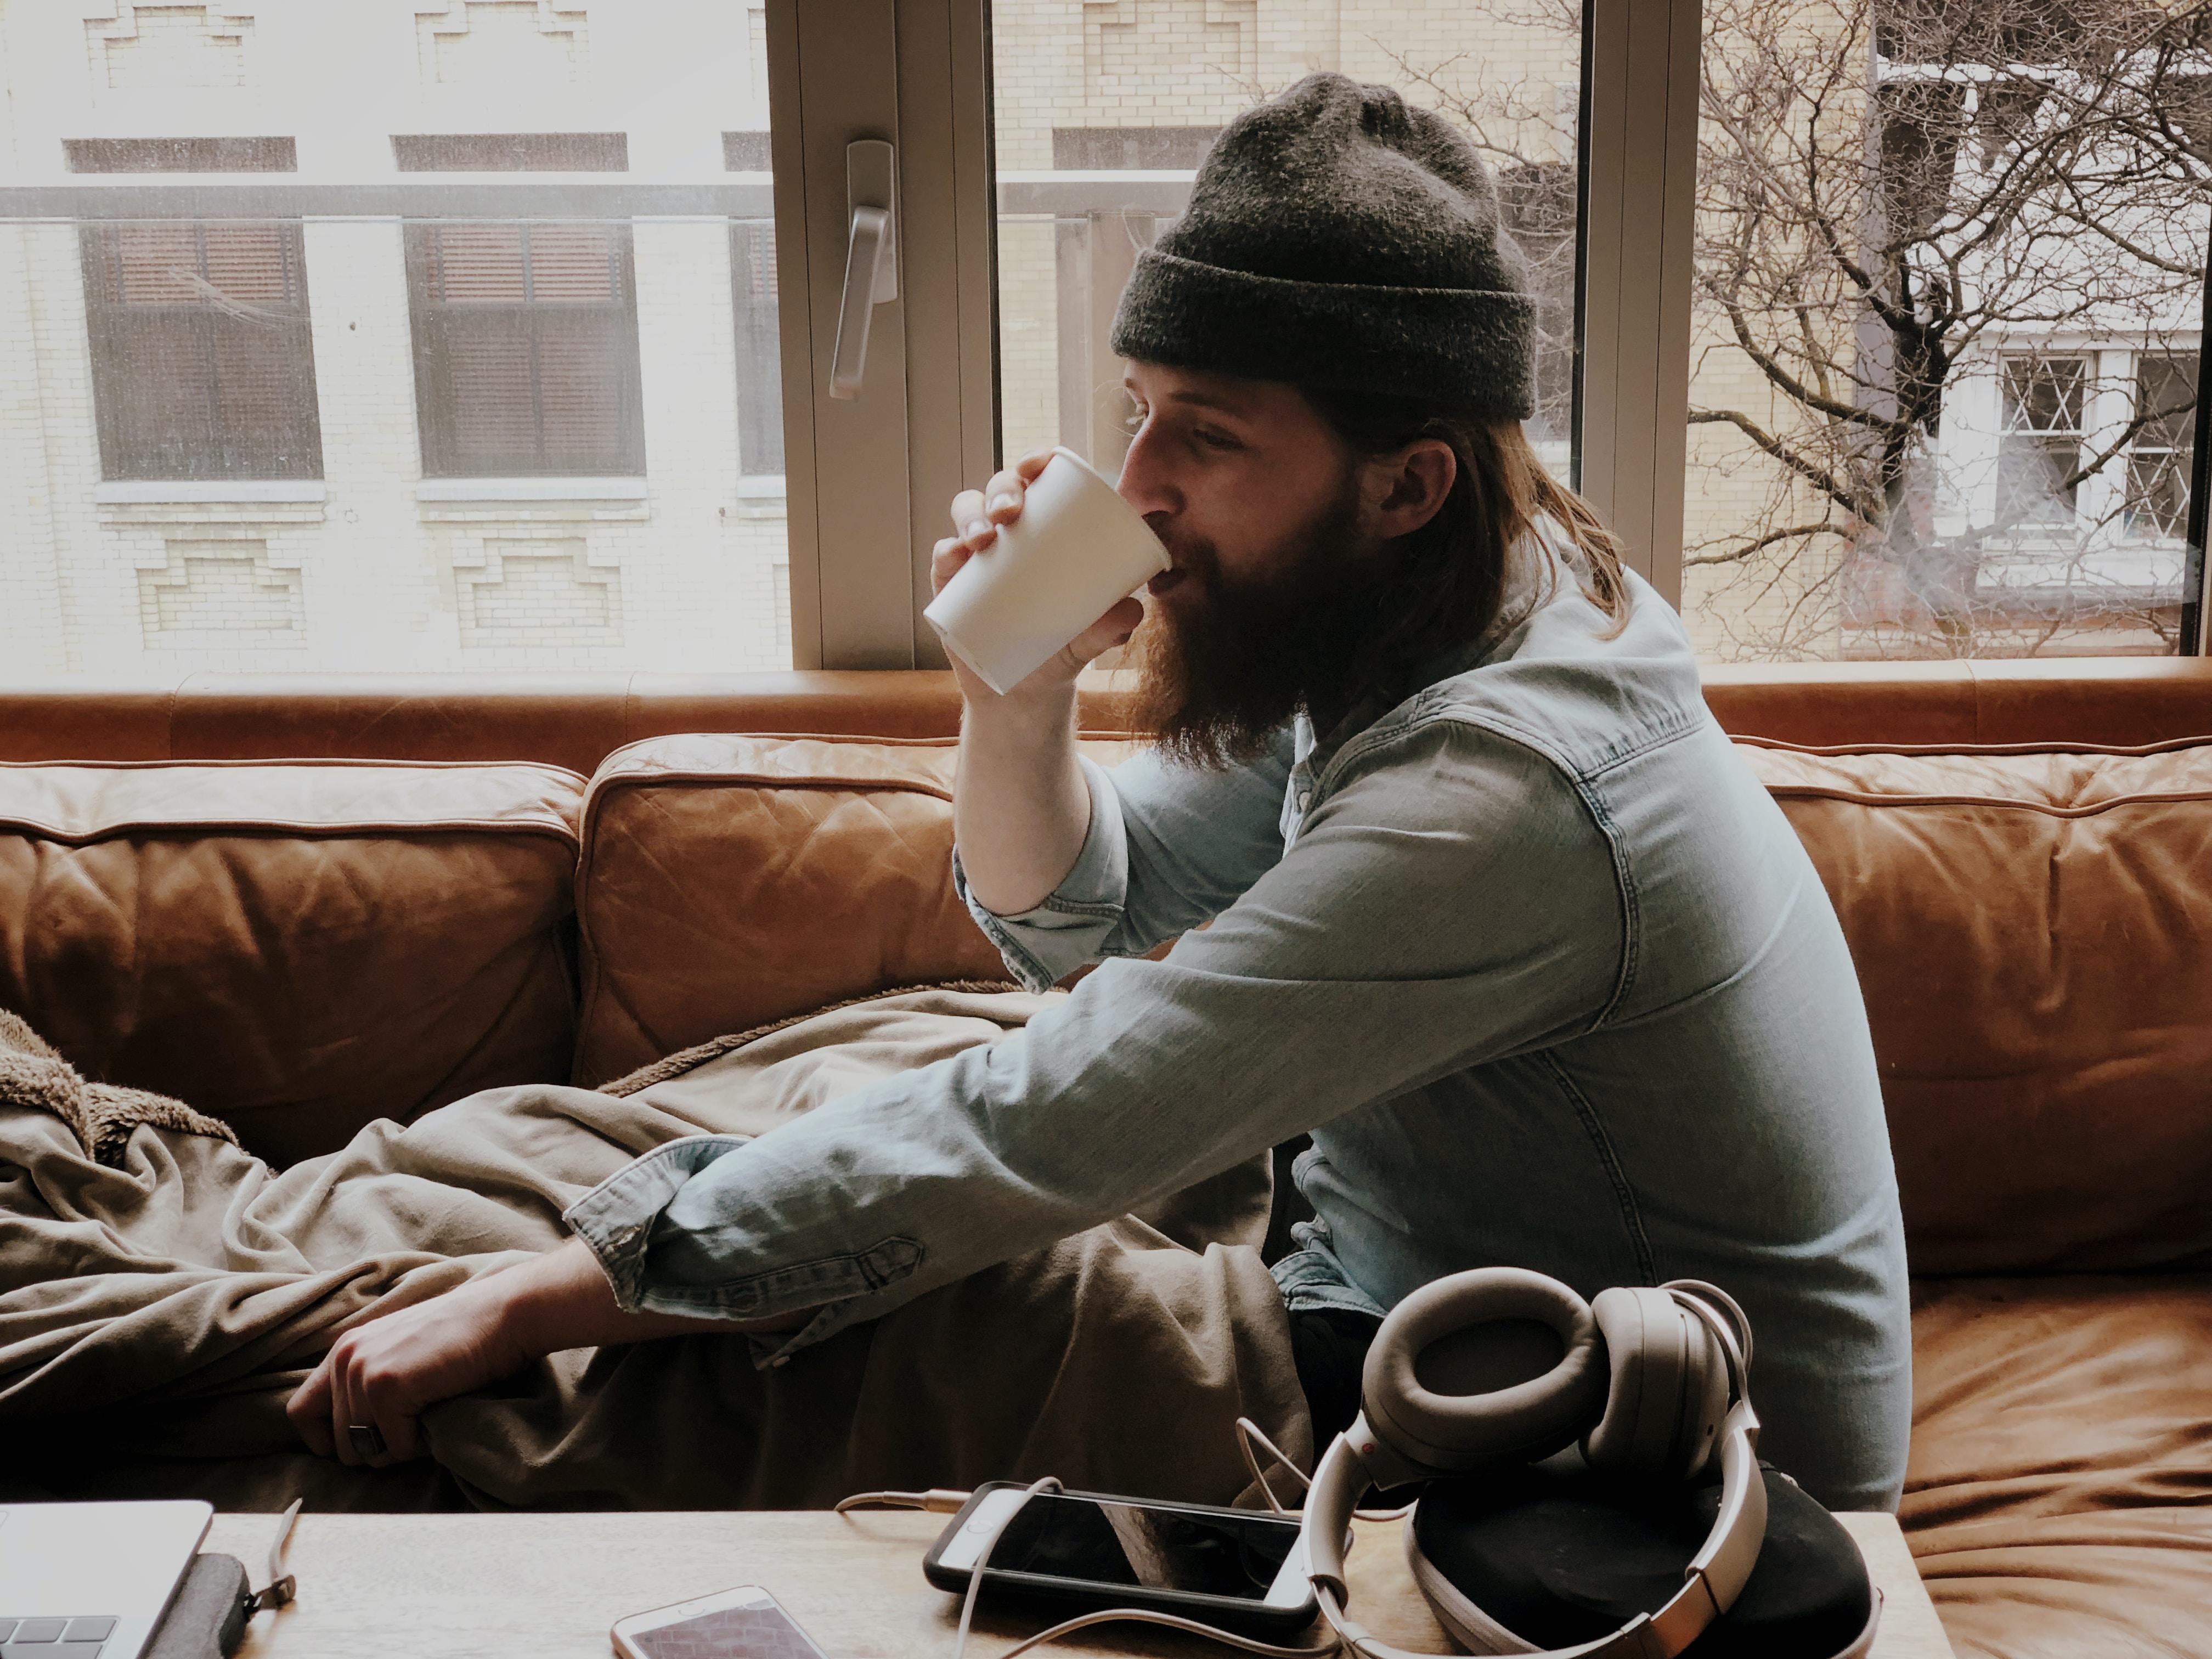 man sitting on sofa while drinking